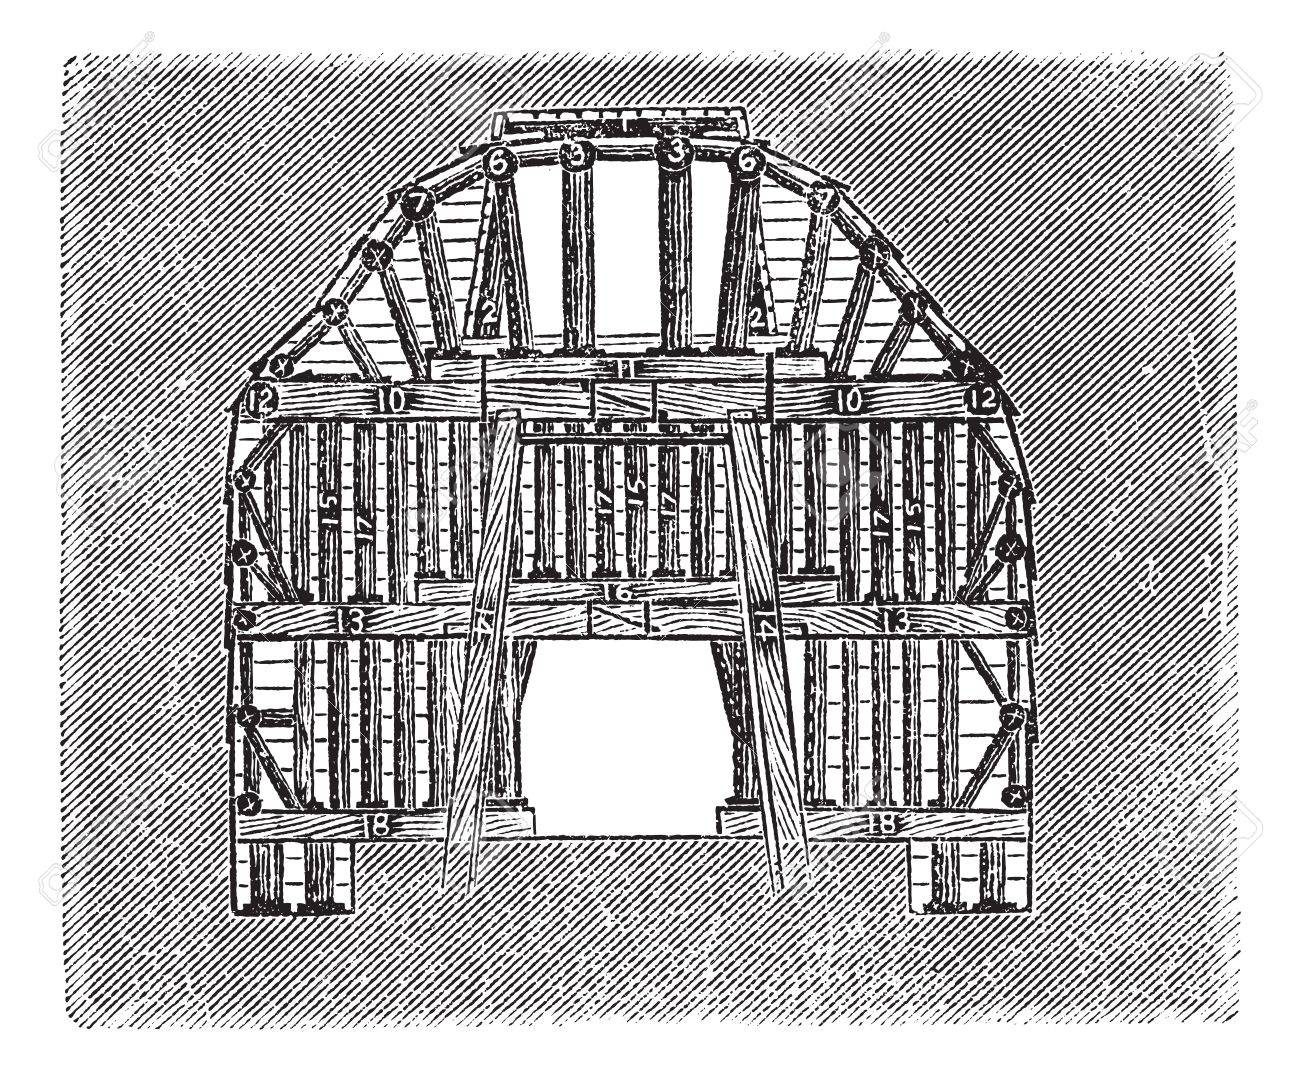 Wooden Tunnel Design, vintage engraved illustration. Trousset encyclopedia (1886 - 1891). Stock Vector - 13708128